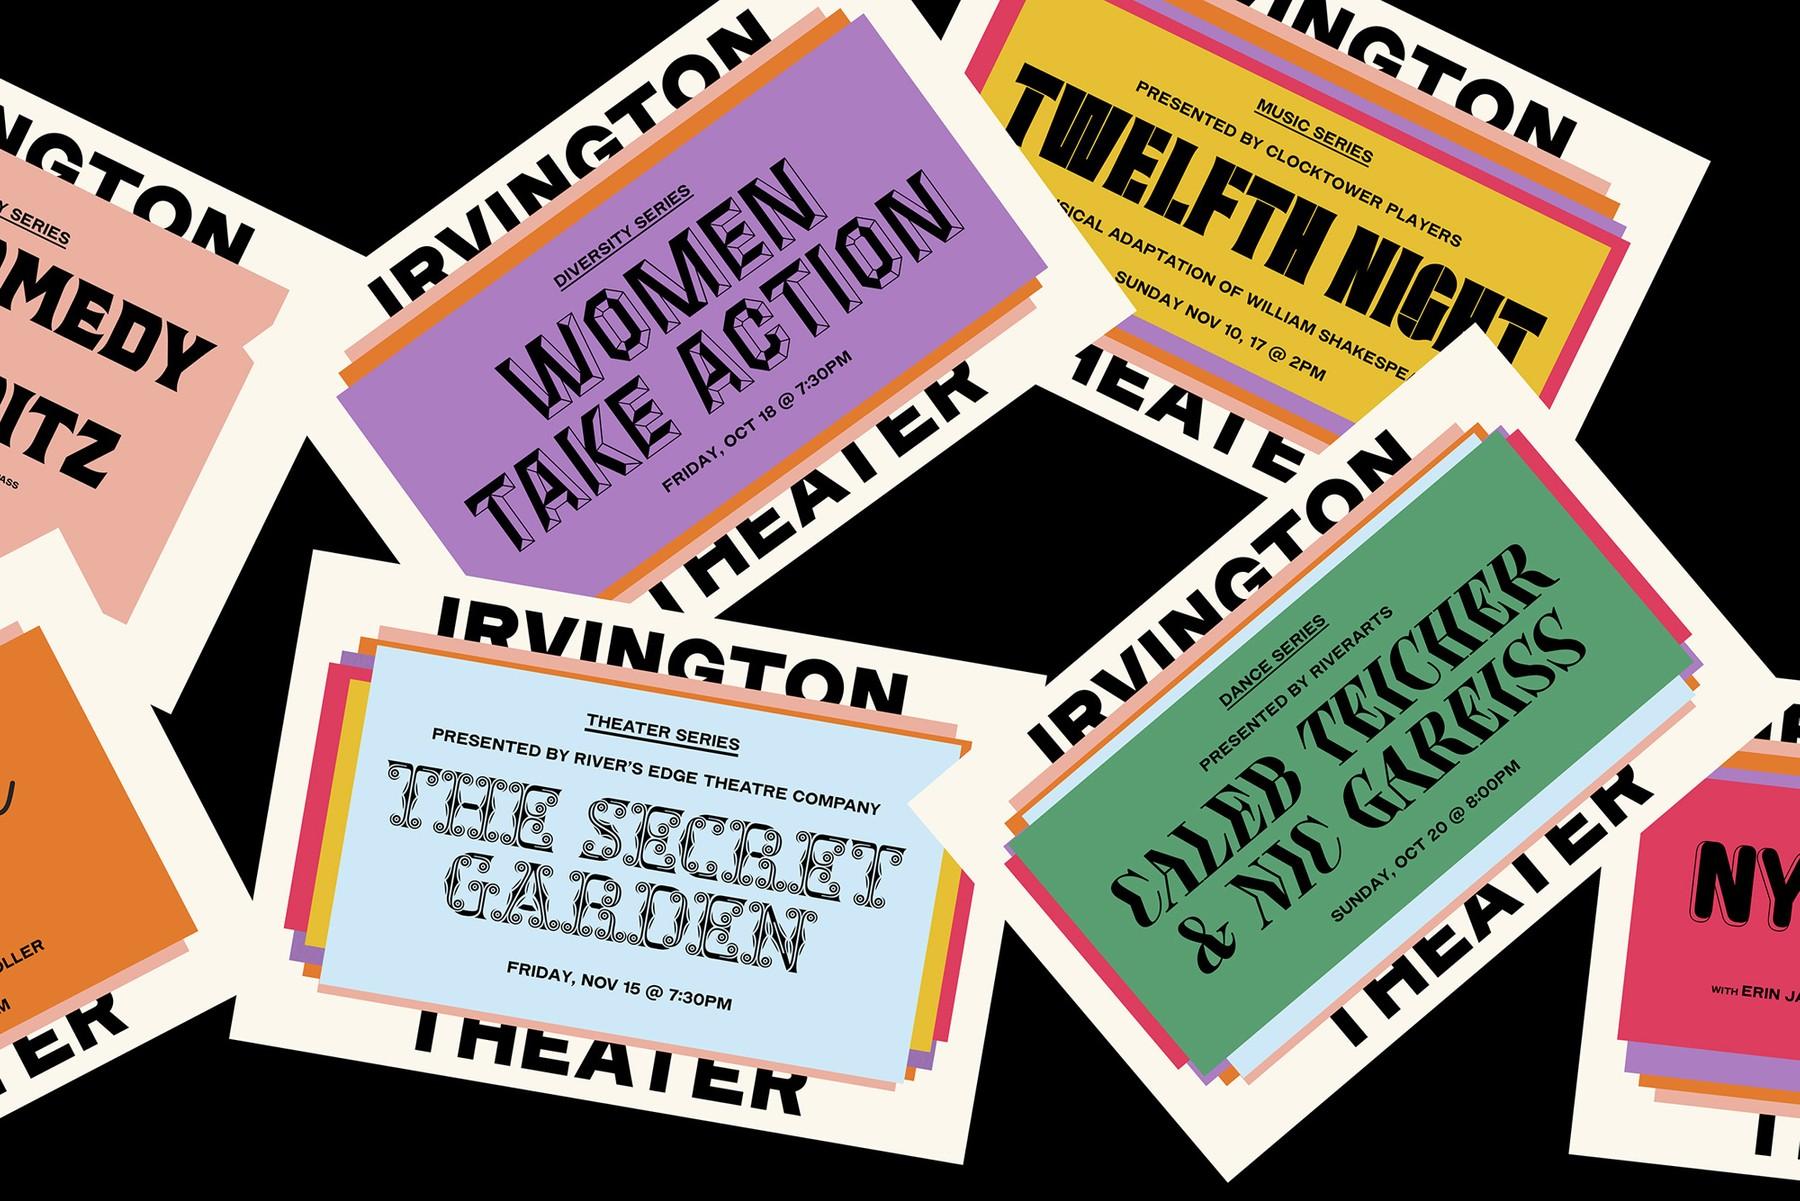 irvington_theater_postcards_flat.jpg